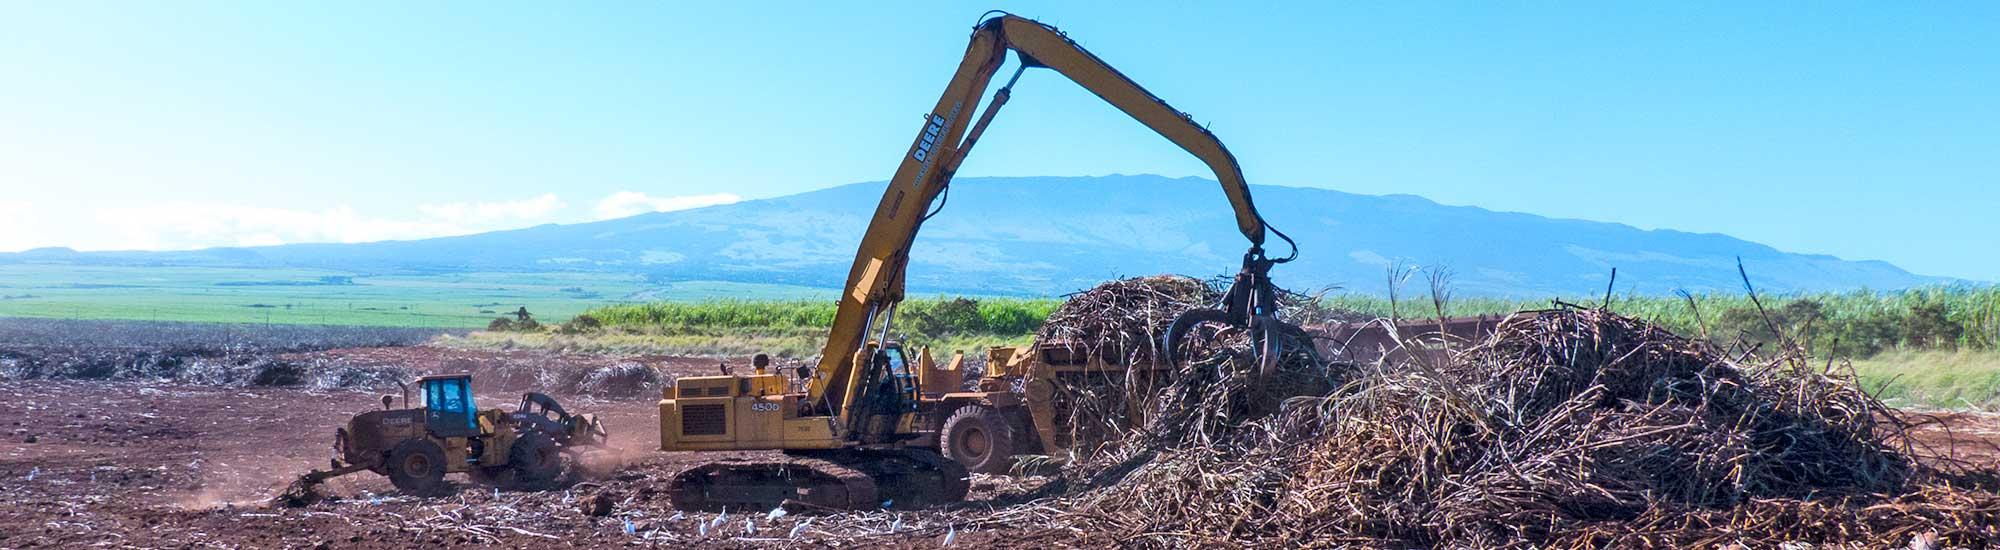 Hawaii Agriculture – Hawaii Agriculture News